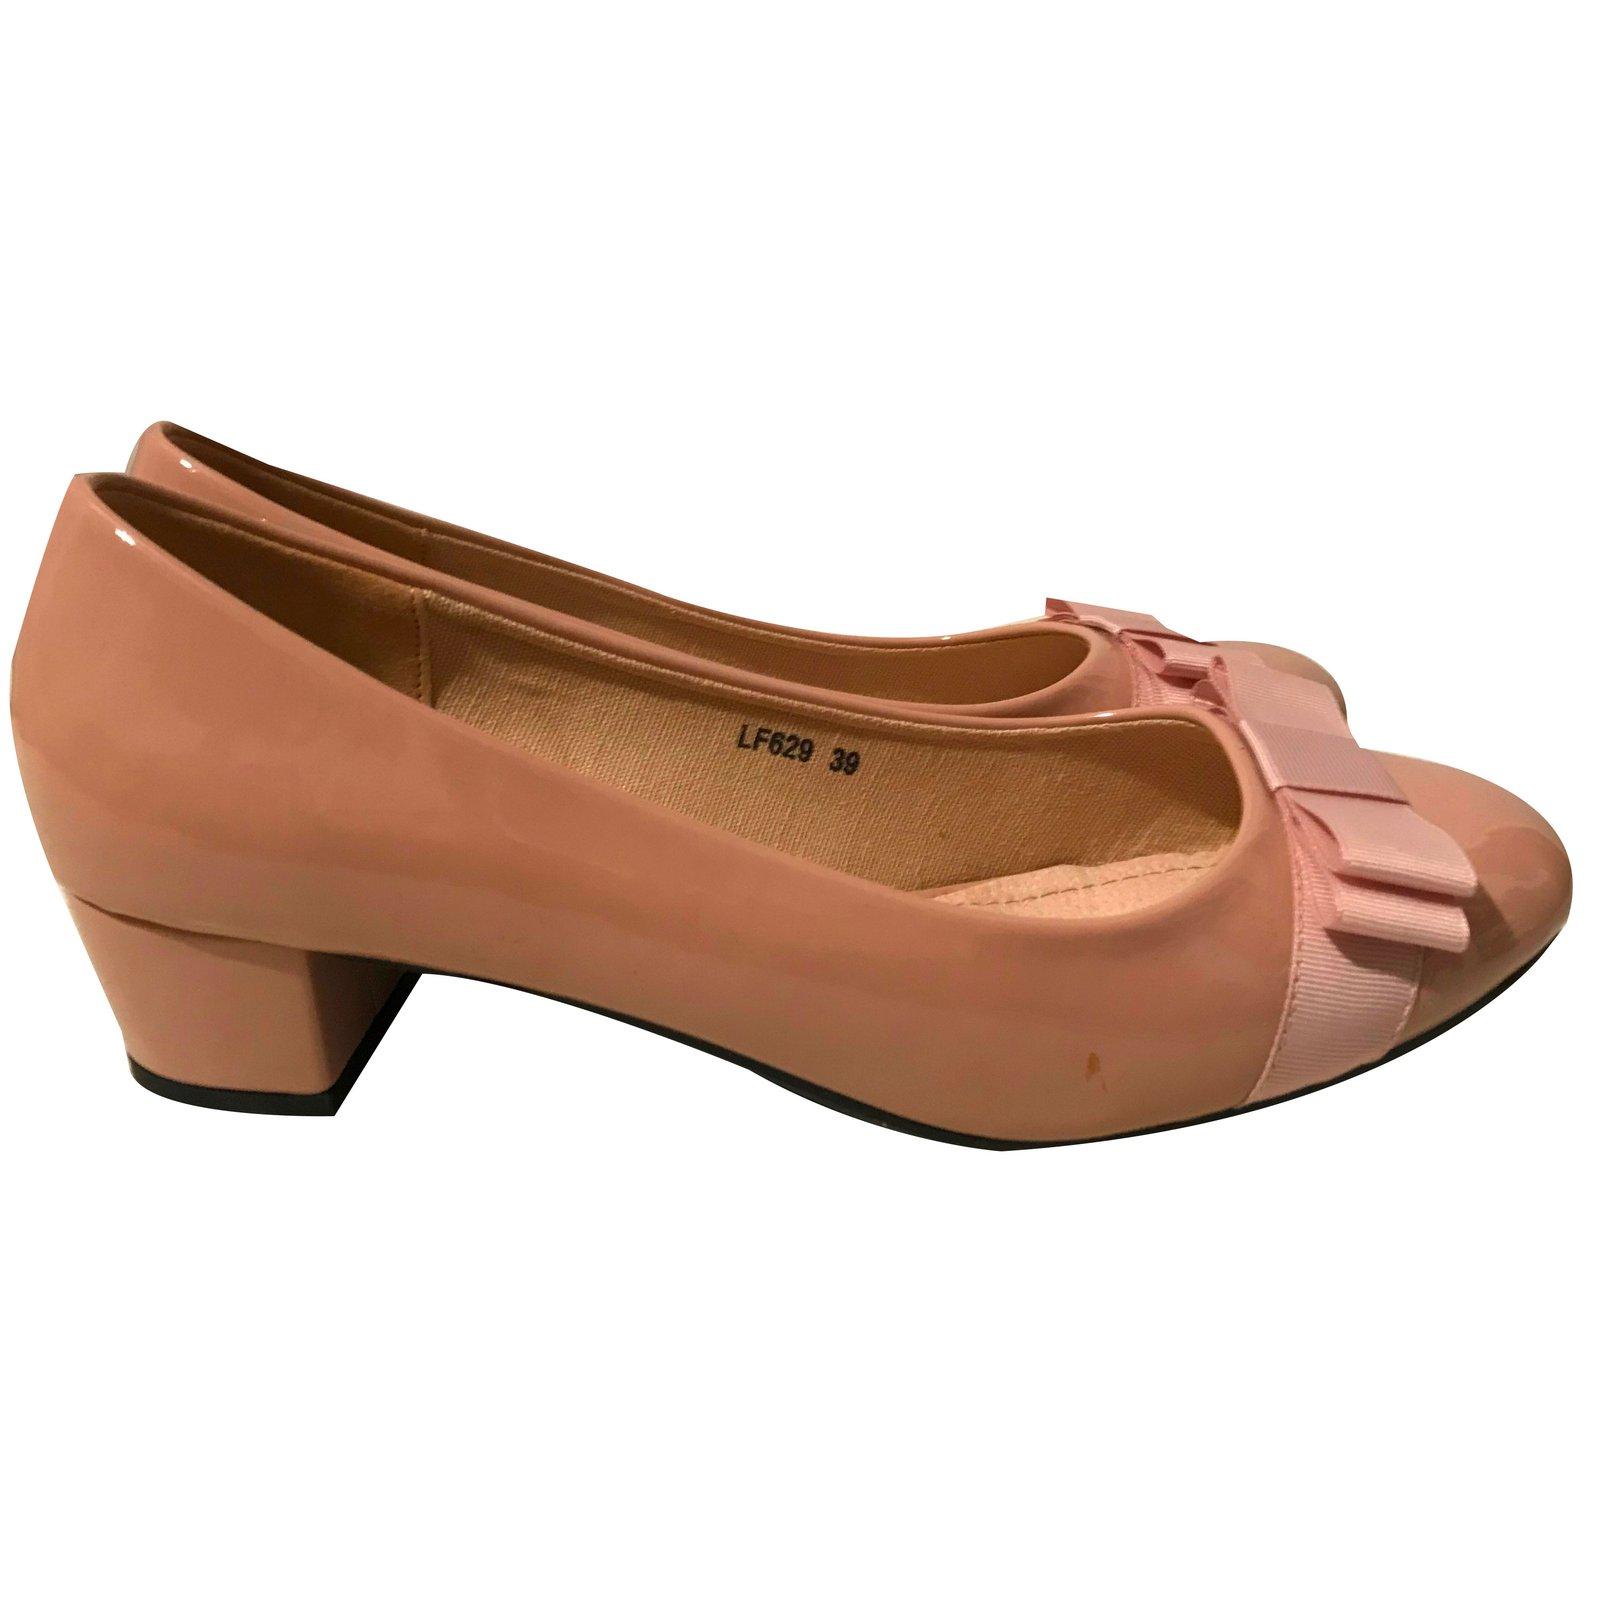 7d15a210bb4a7b Ballerines LA BOTTINE SOURIANTE cuir verni beige 39 wdHoe - poll ...